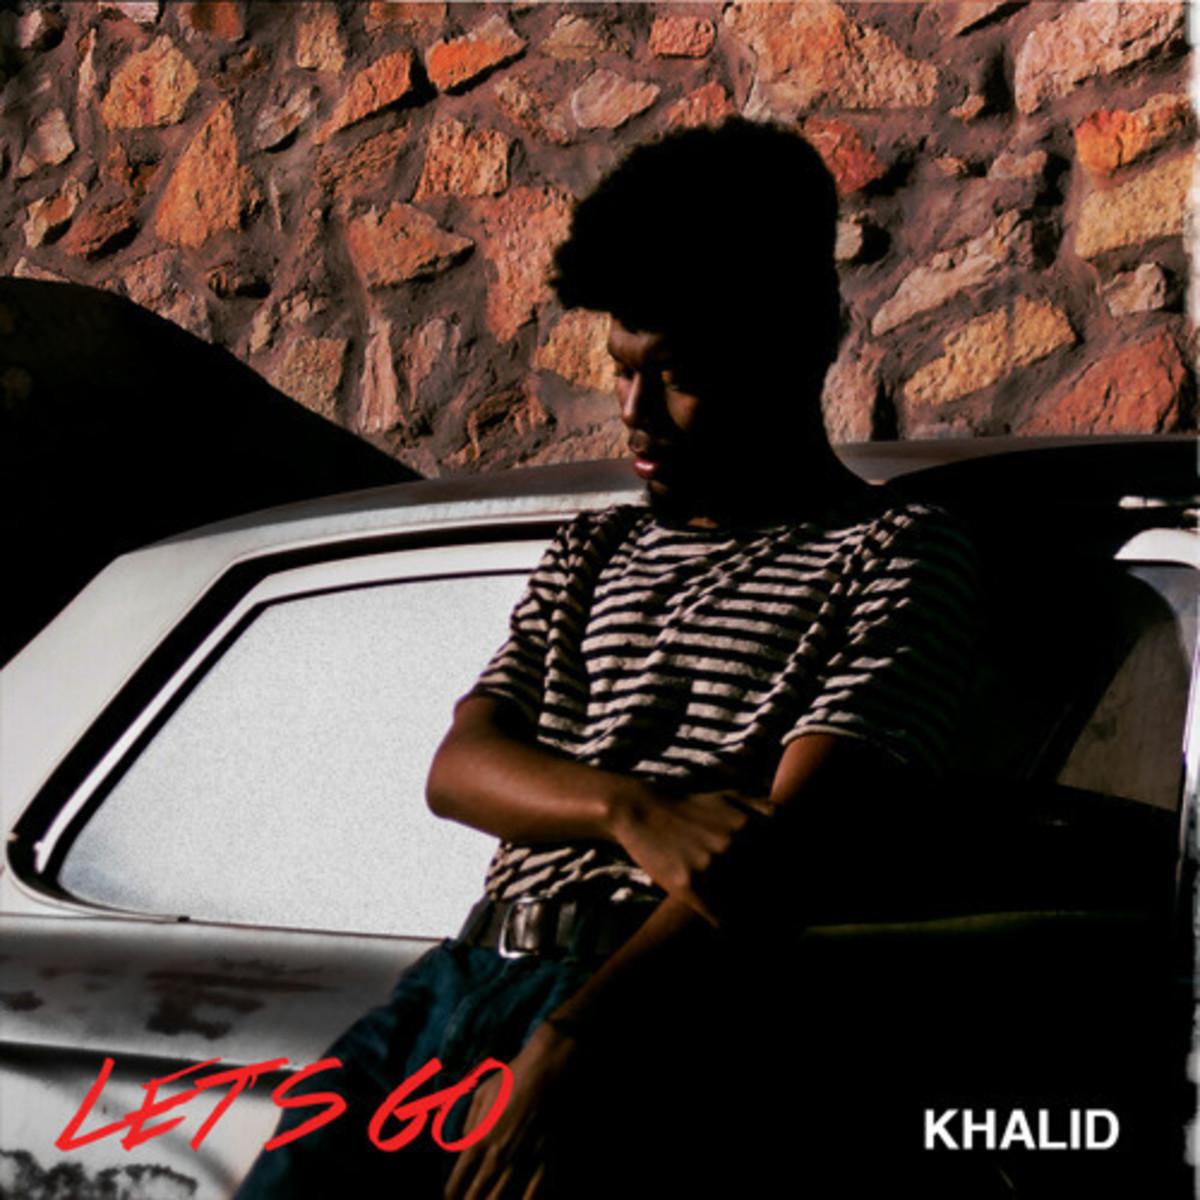 khalid-lets-go.jpg